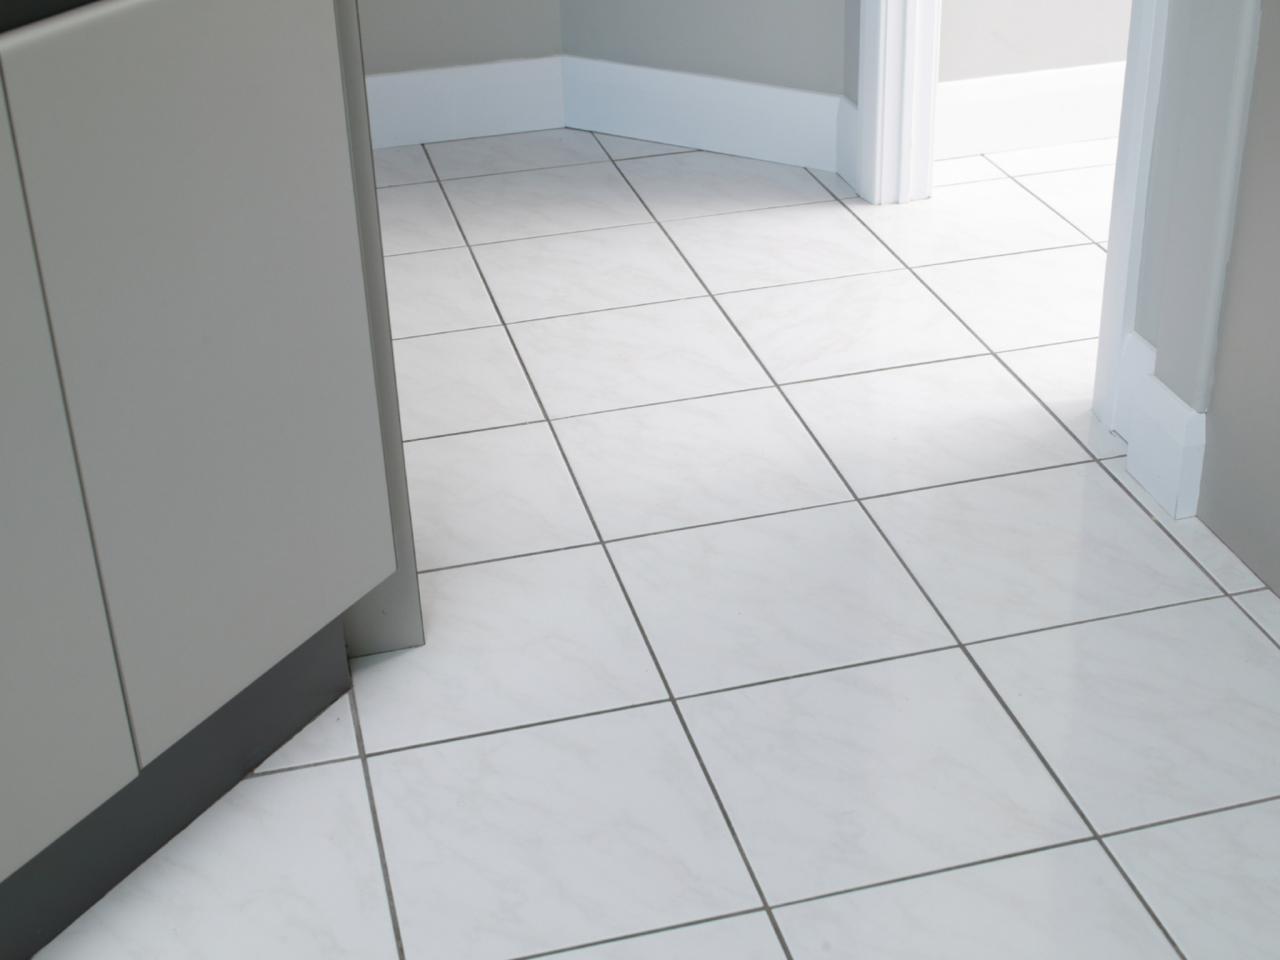 Knowledge On Ceramic Tile Installation